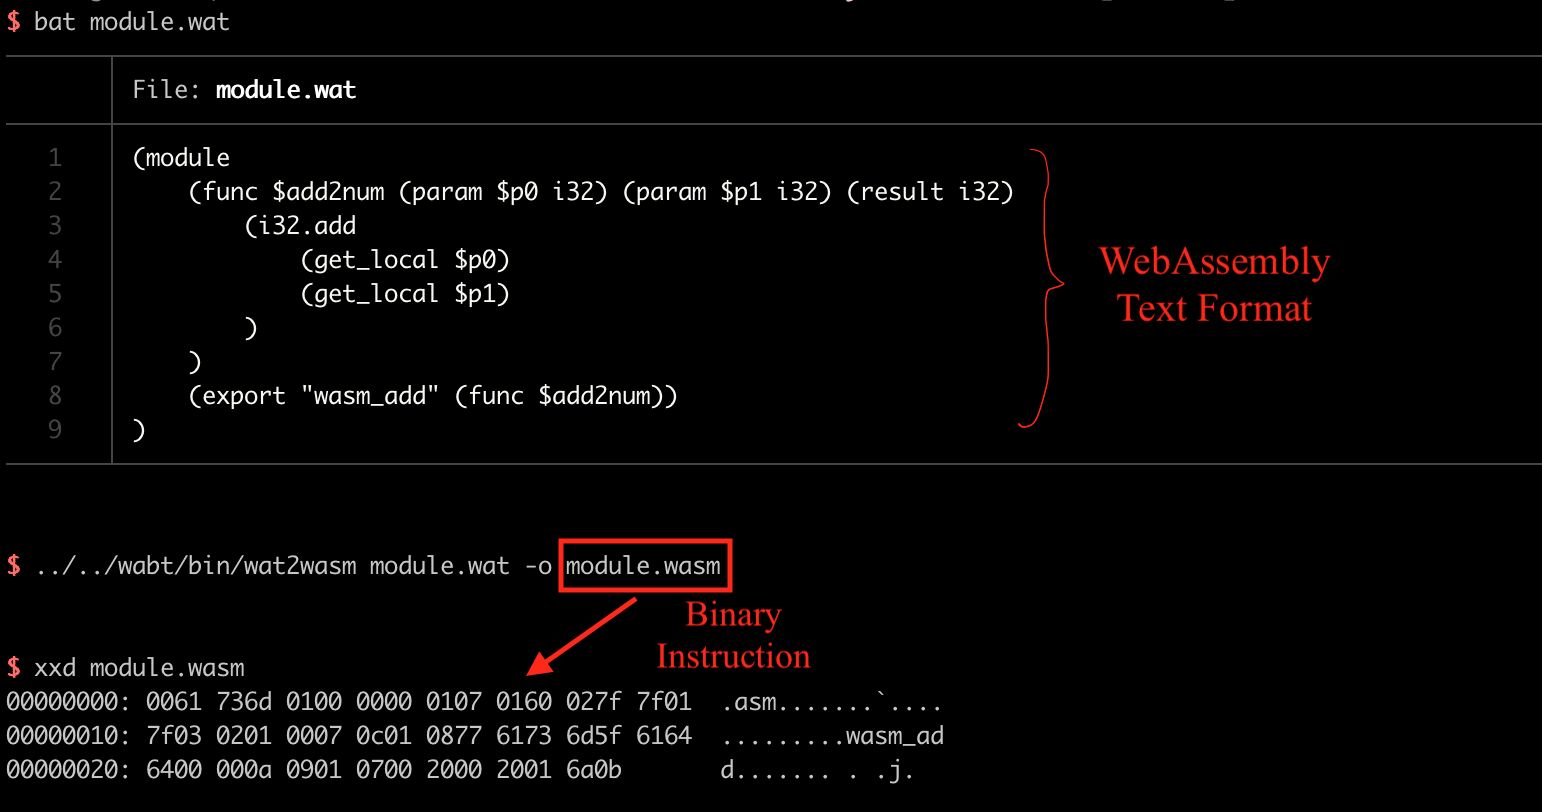 lệnh để biên dịch module.wat